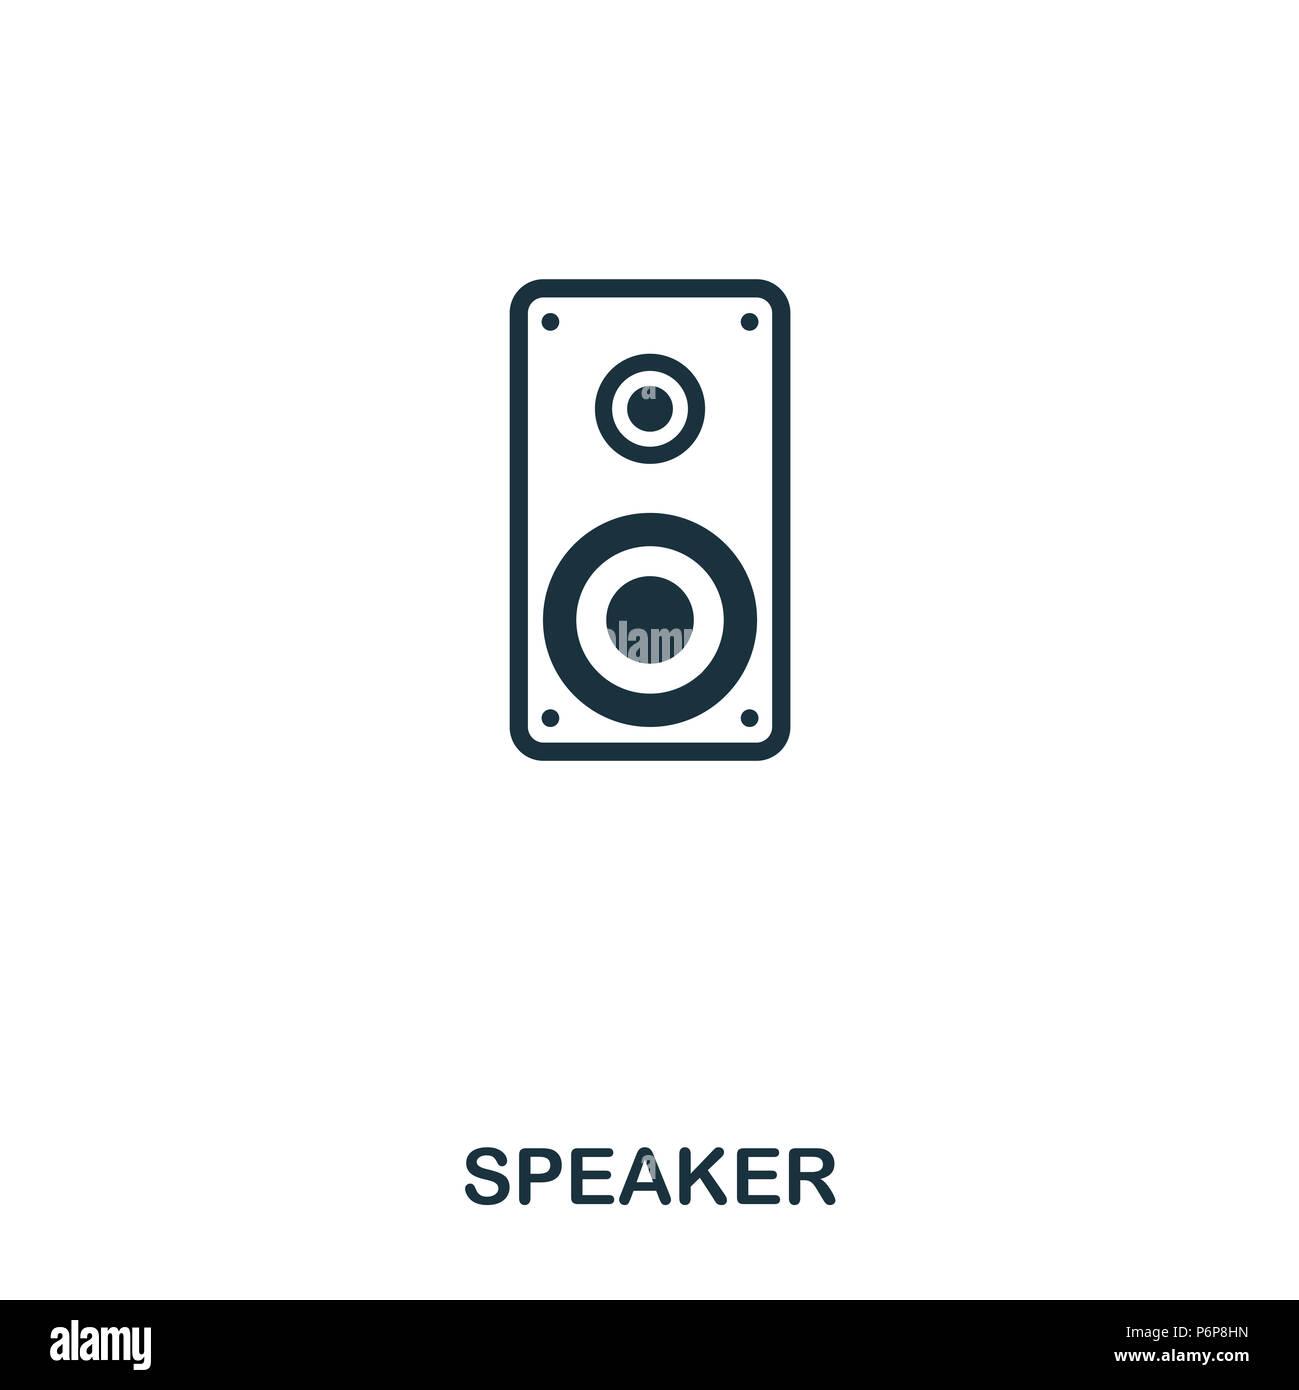 Speaker Icon Line Style Icon Design Ui Illustration Of Speaker